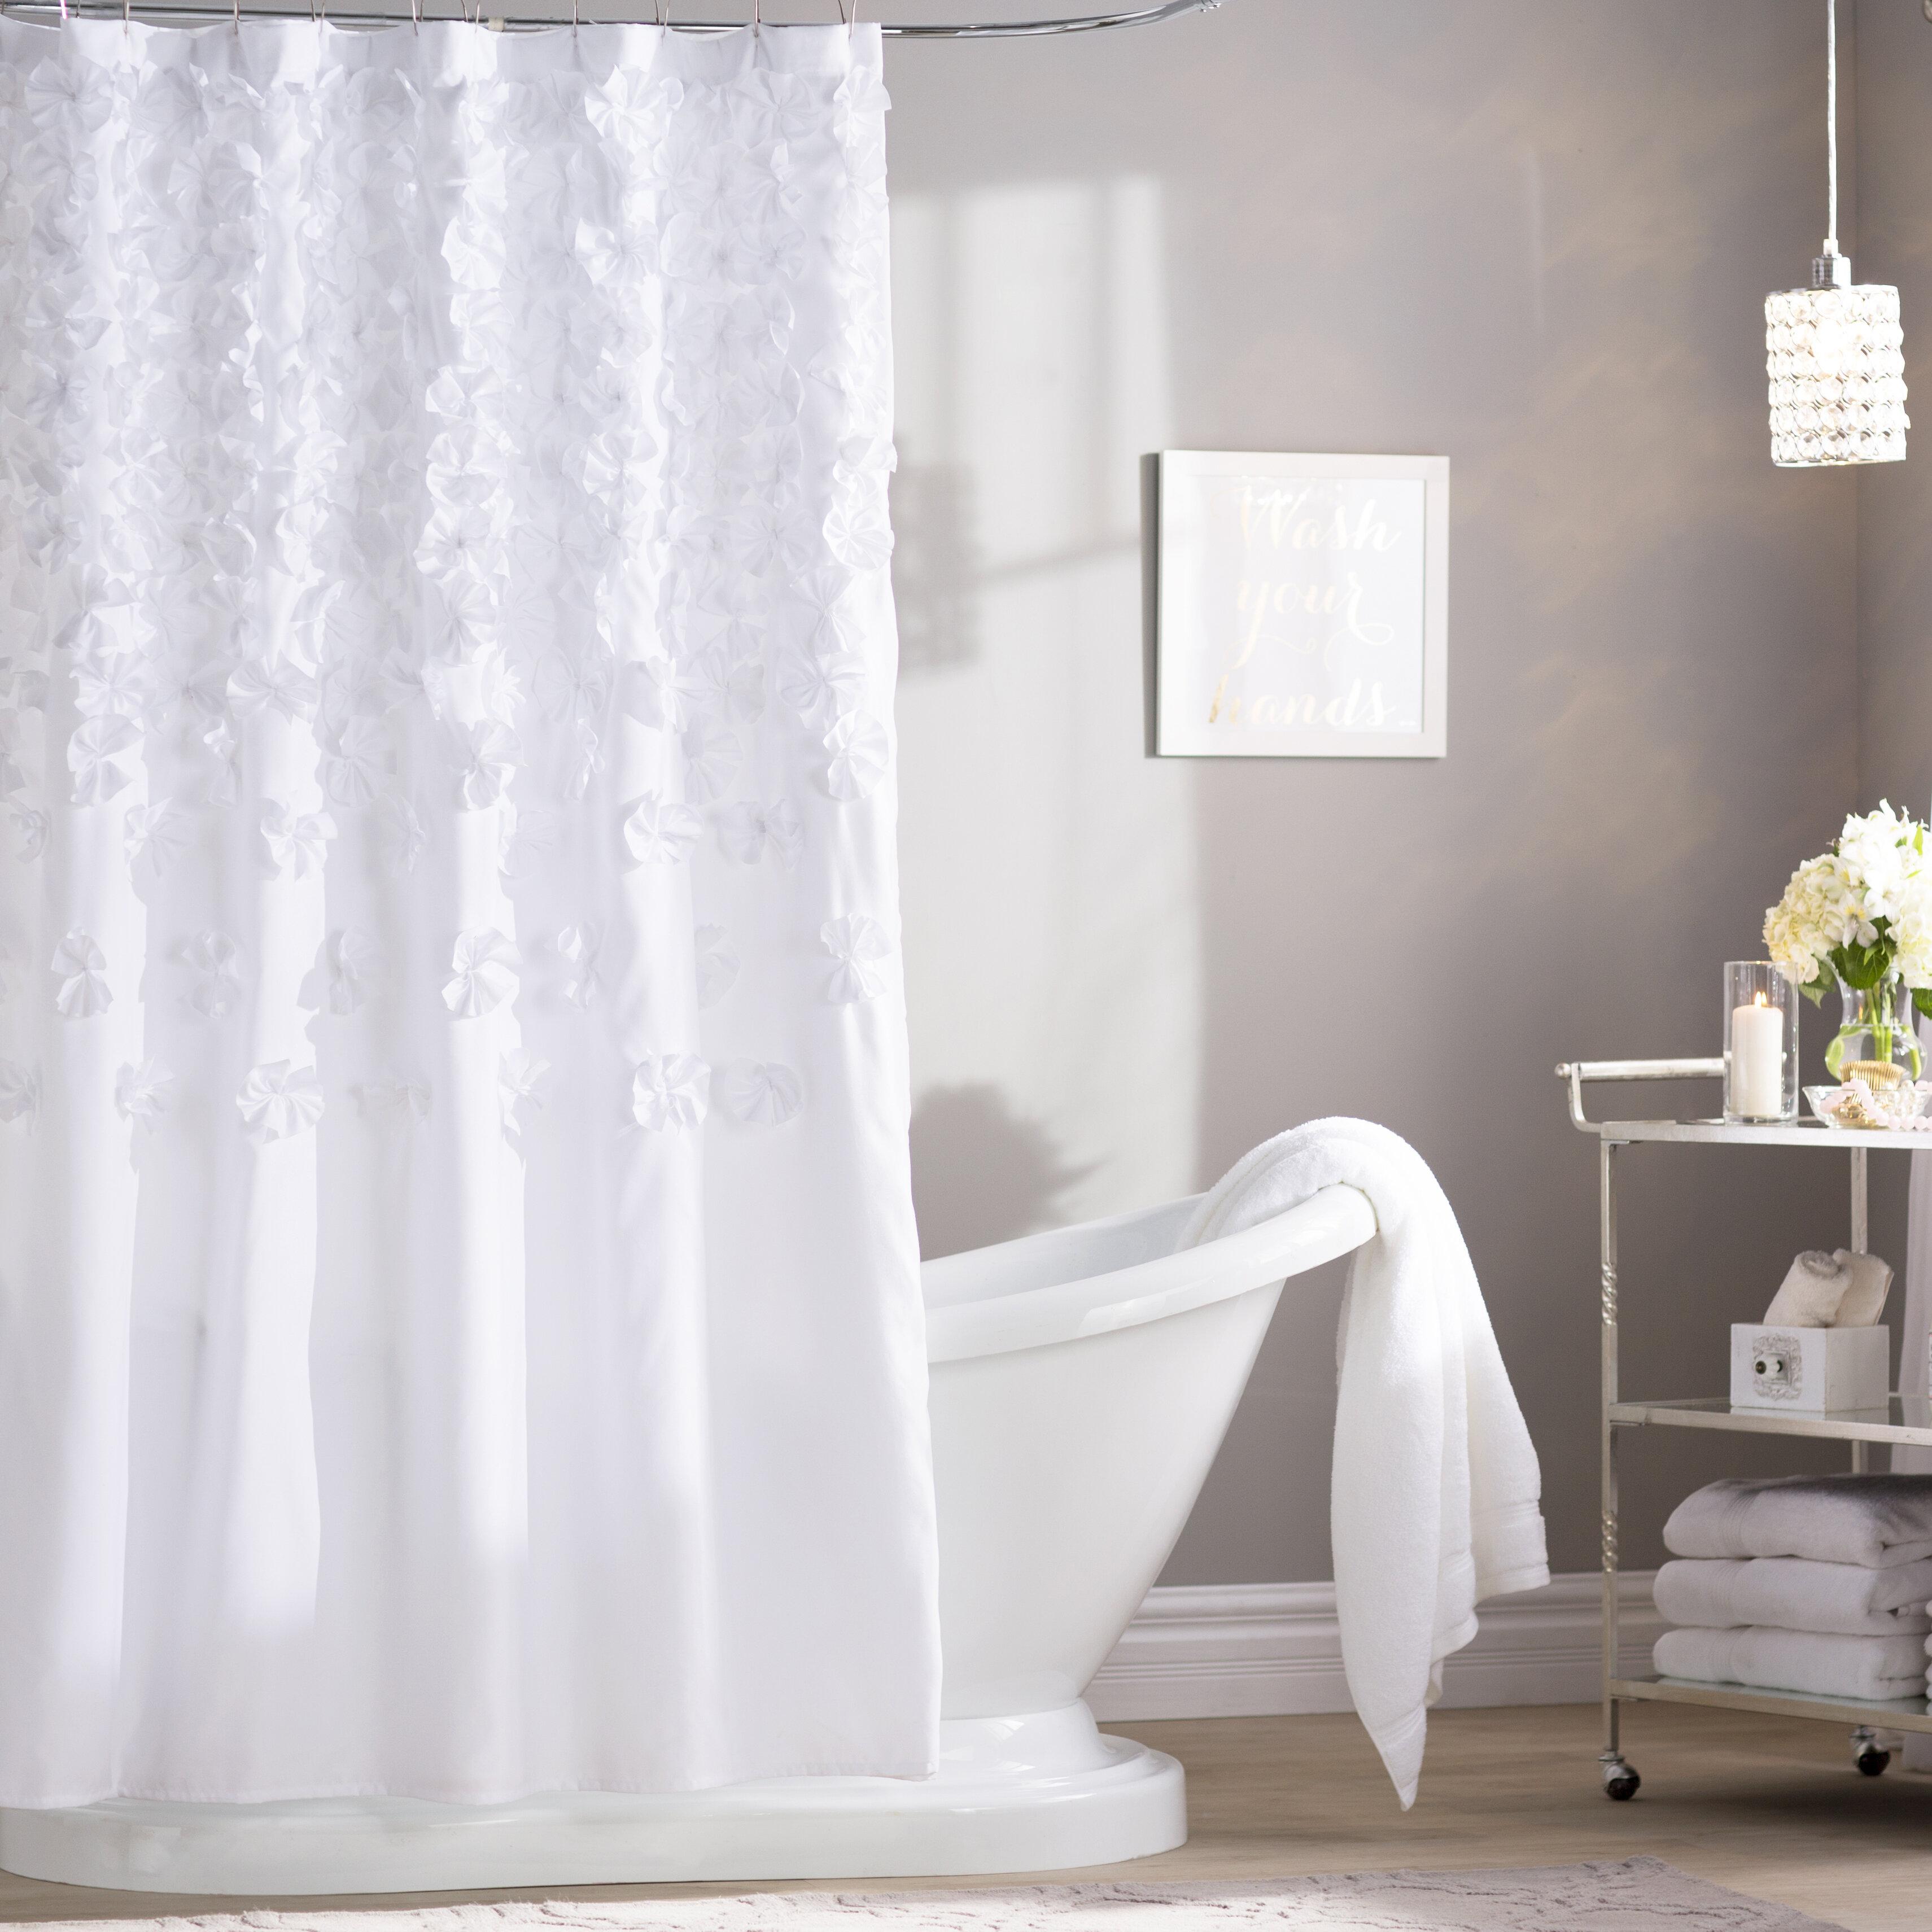 Willa Arlo Interiors Rieke Shower Curtain & Reviews | Wayfair